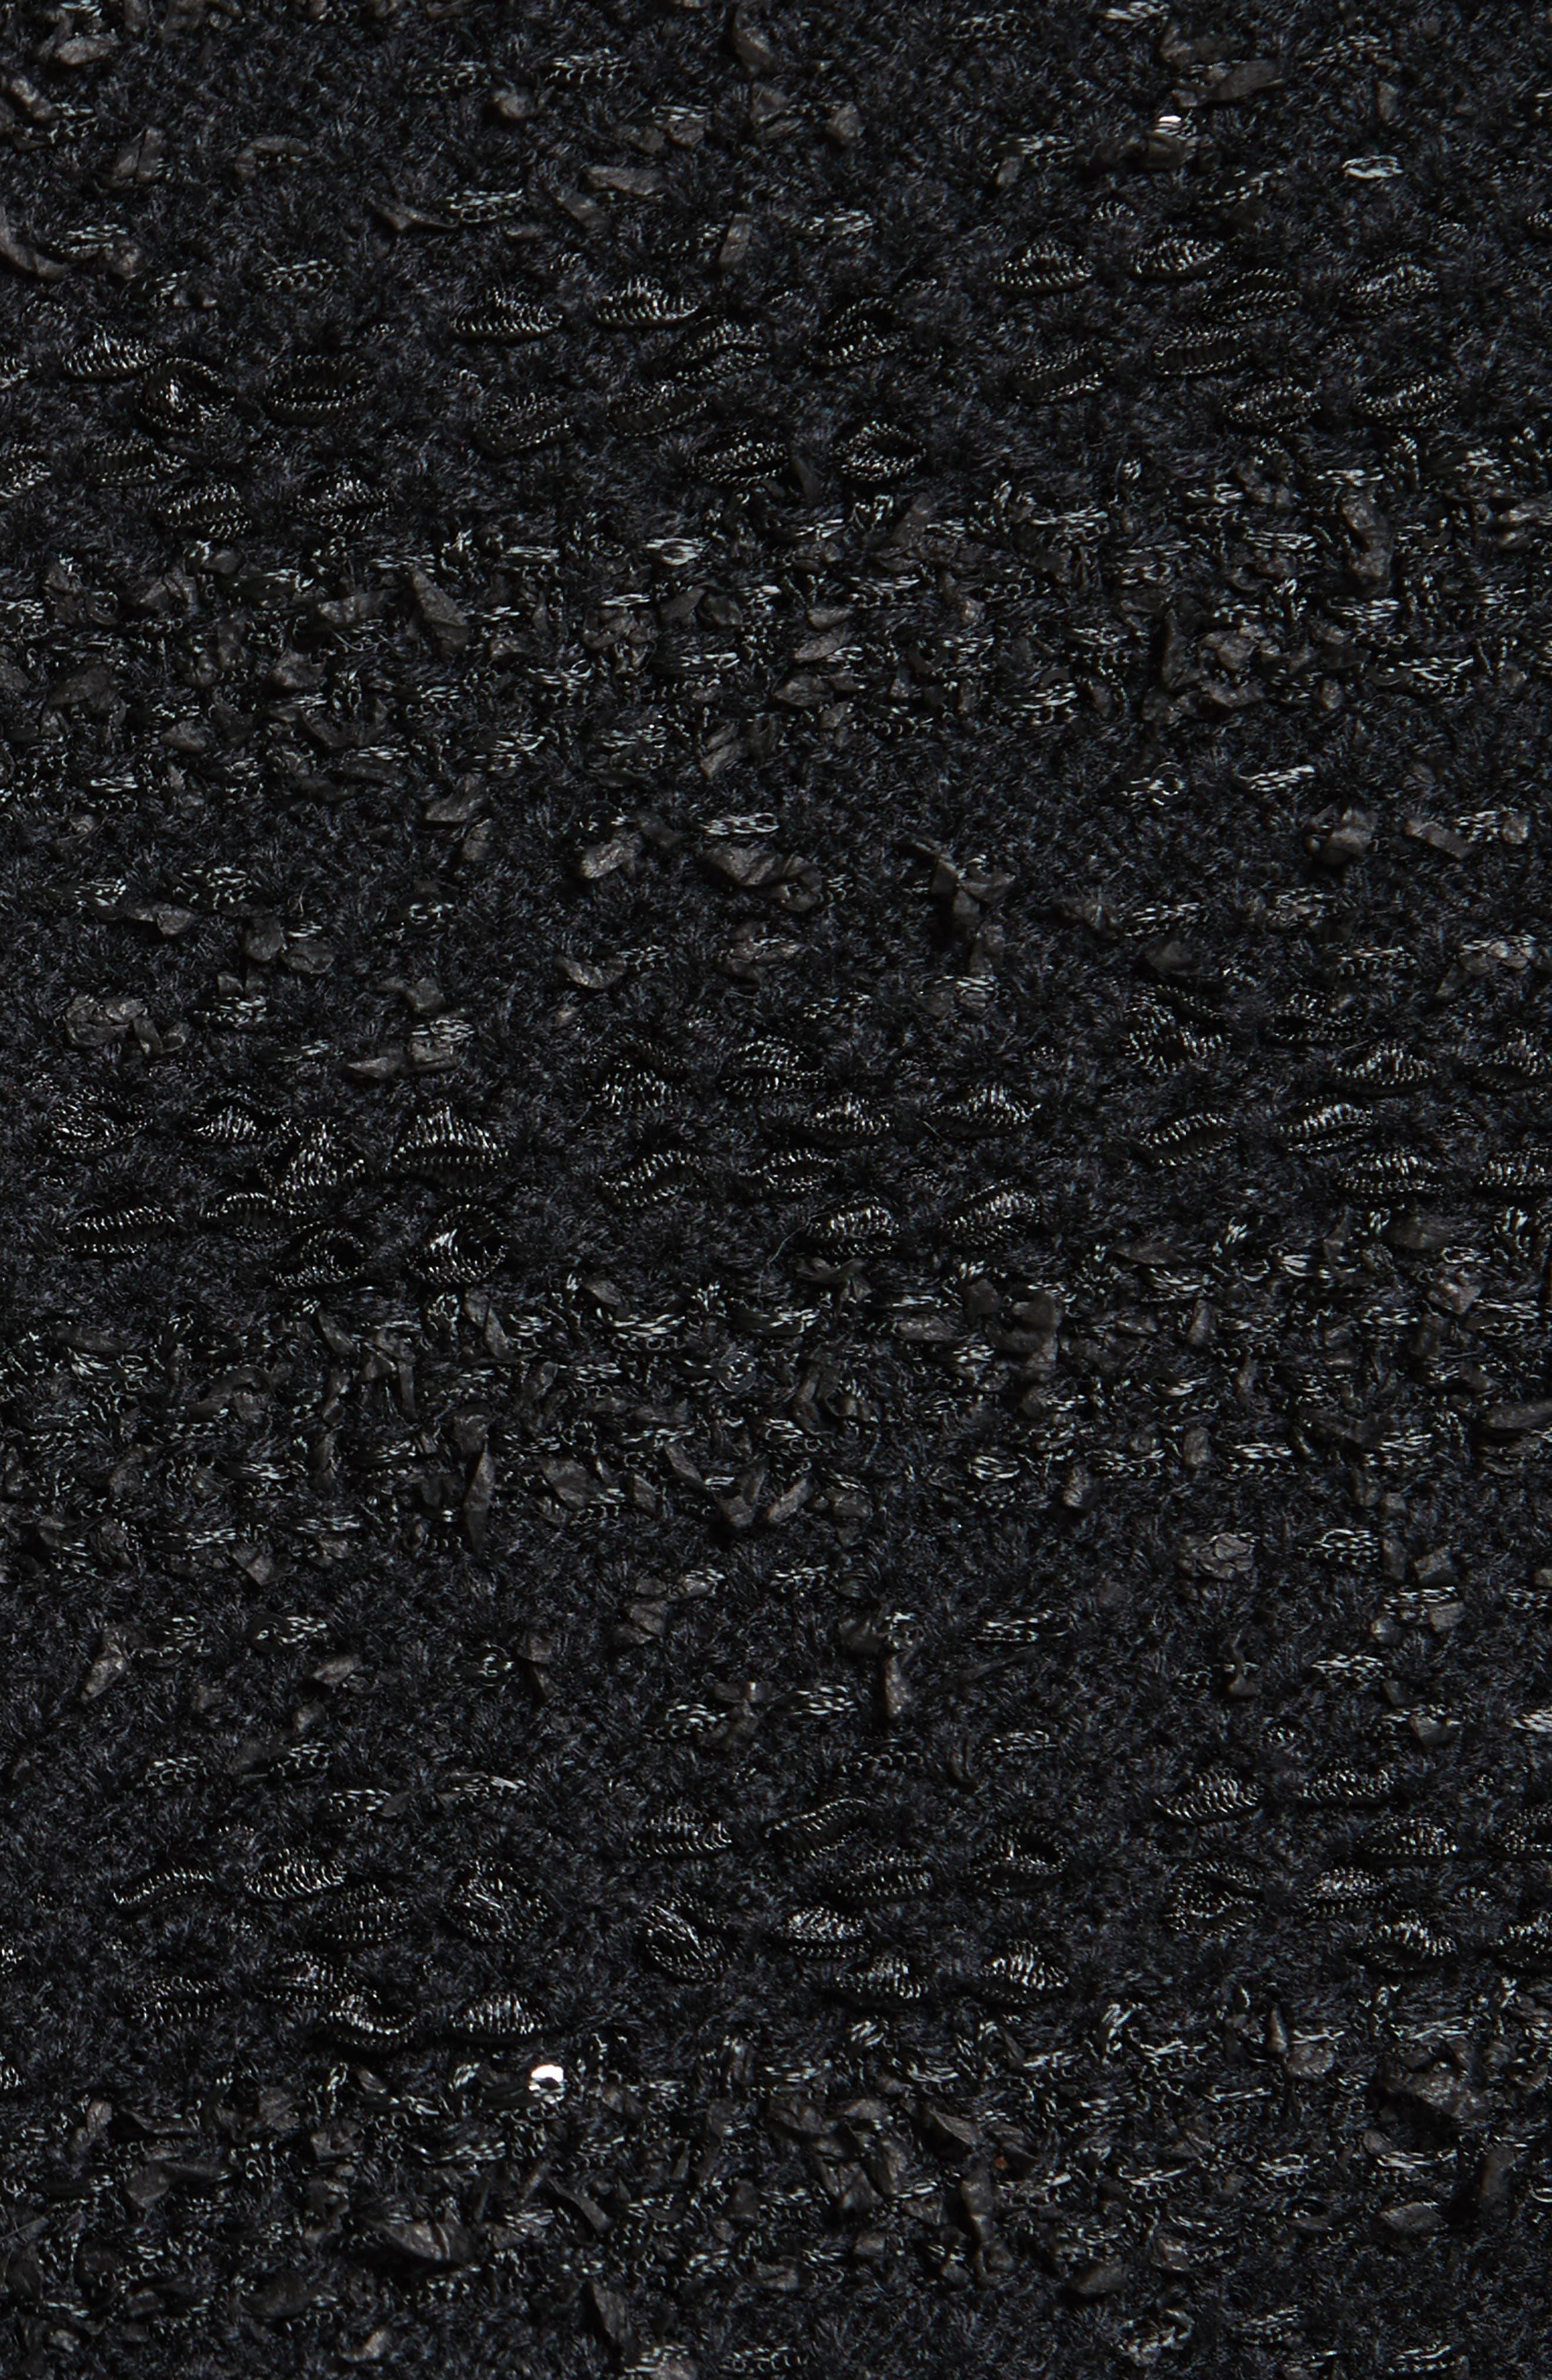 Sequin Knit Topper with Detachable Genuine Rabbit Fur Collar,                             Alternate thumbnail 7, color,                             001